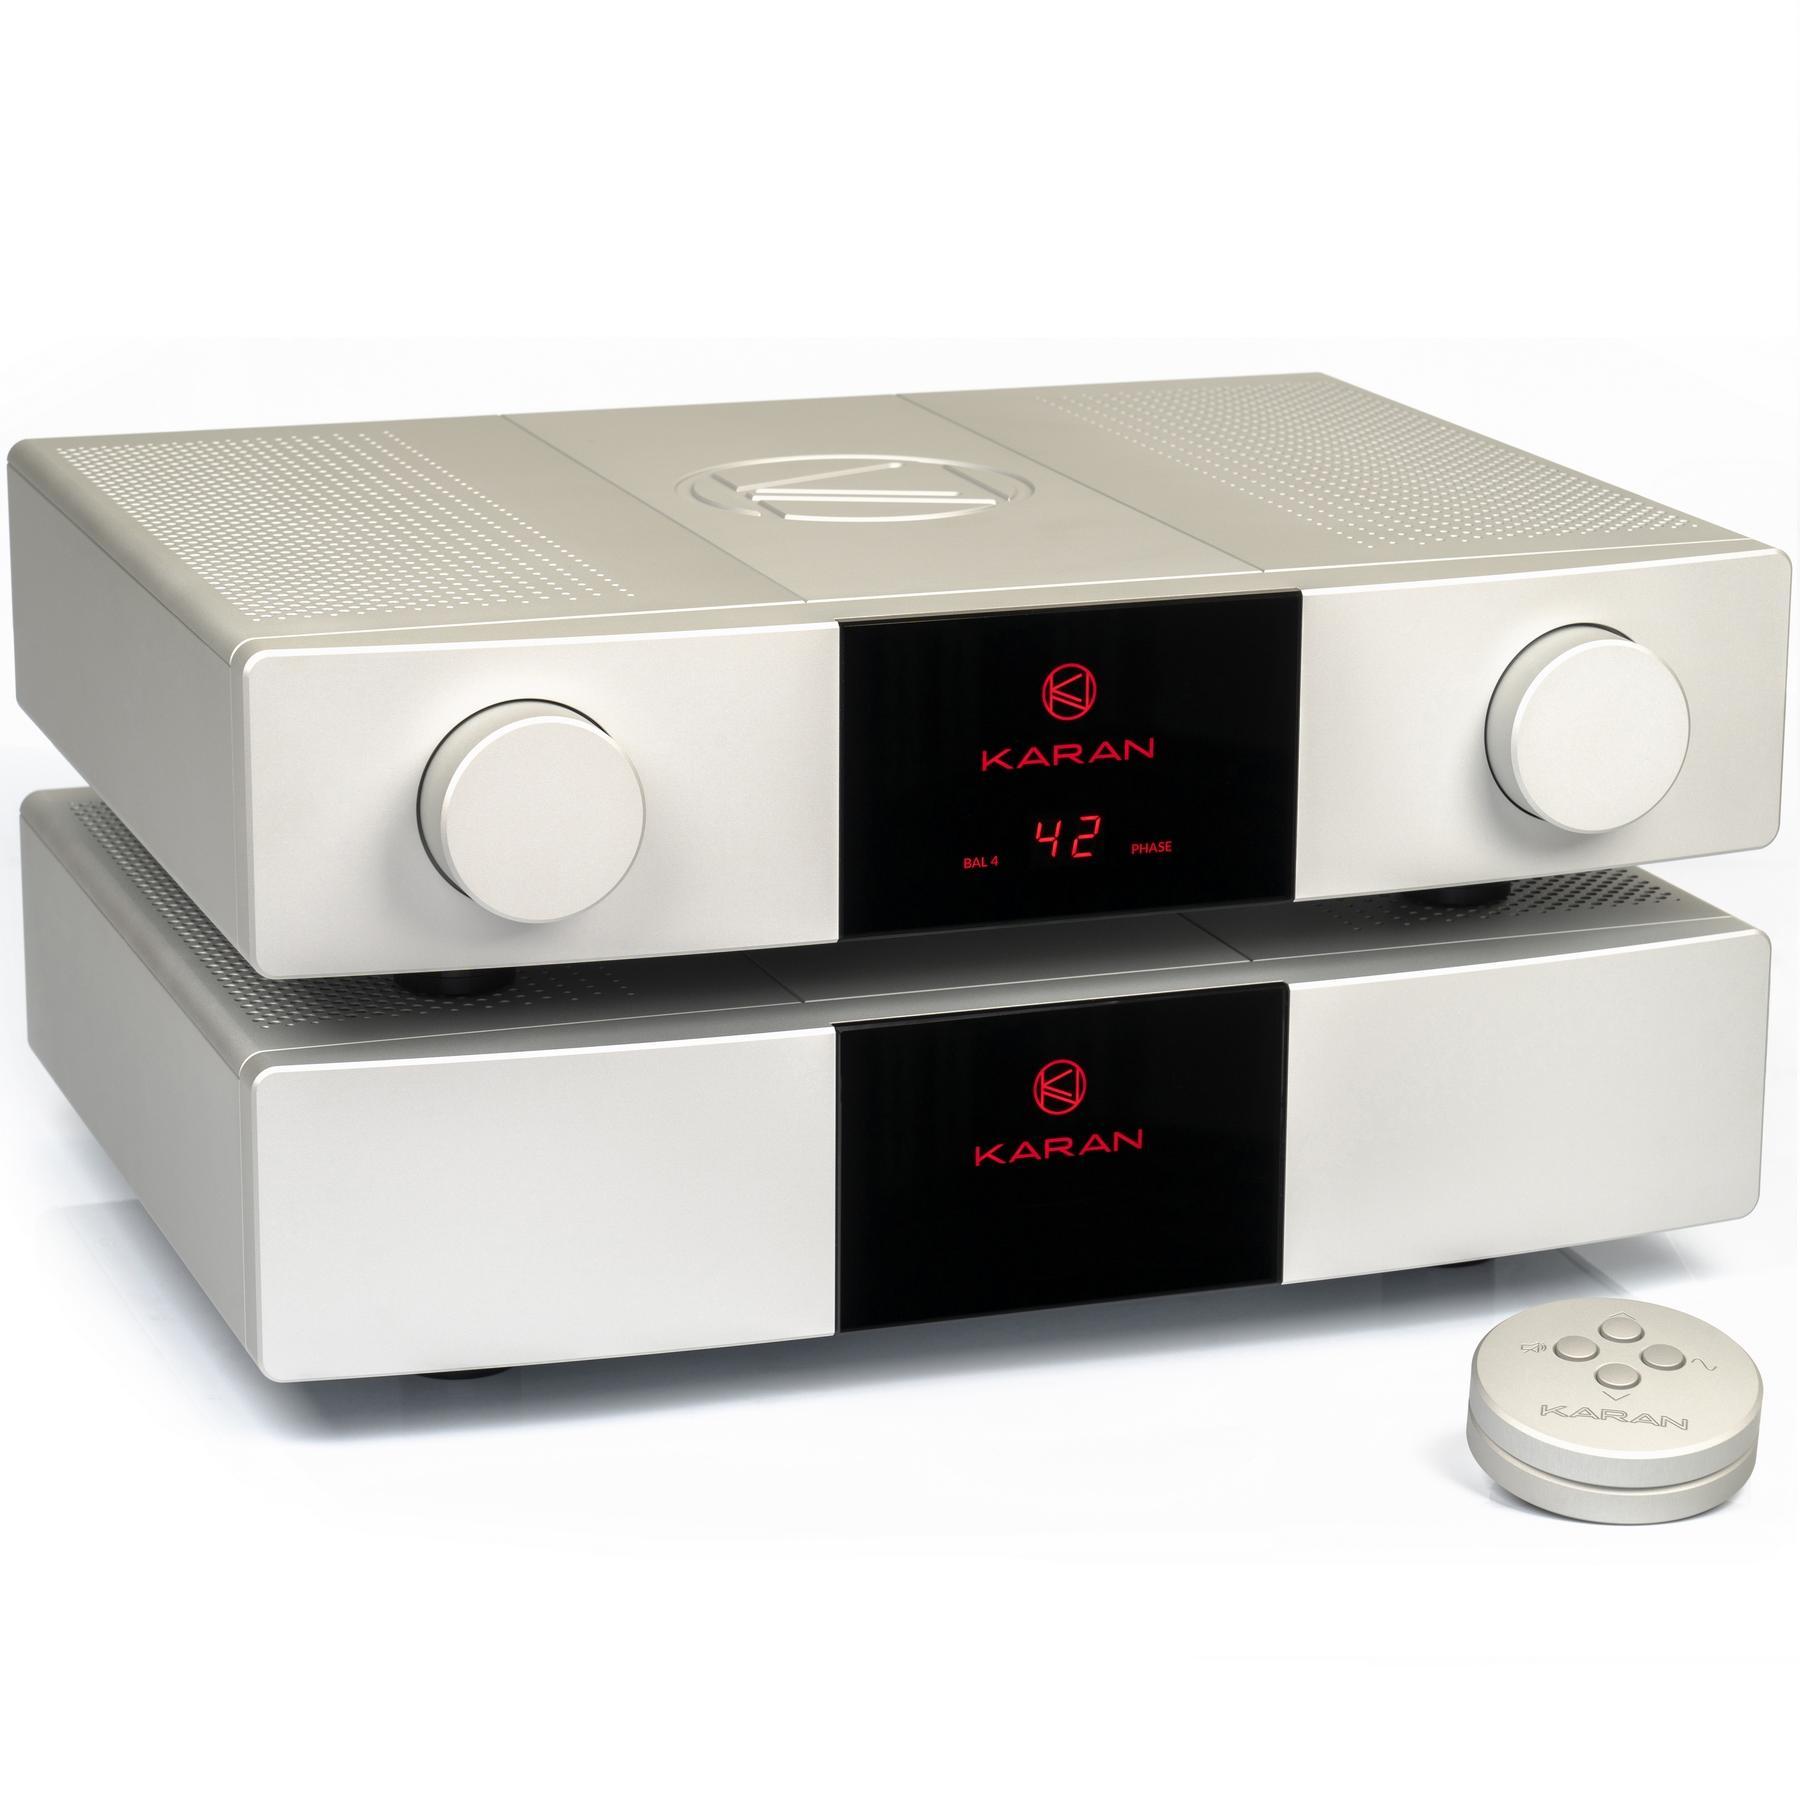 Предусилитель Karan Acoustics Master Collection LINEa & PSUa Silver